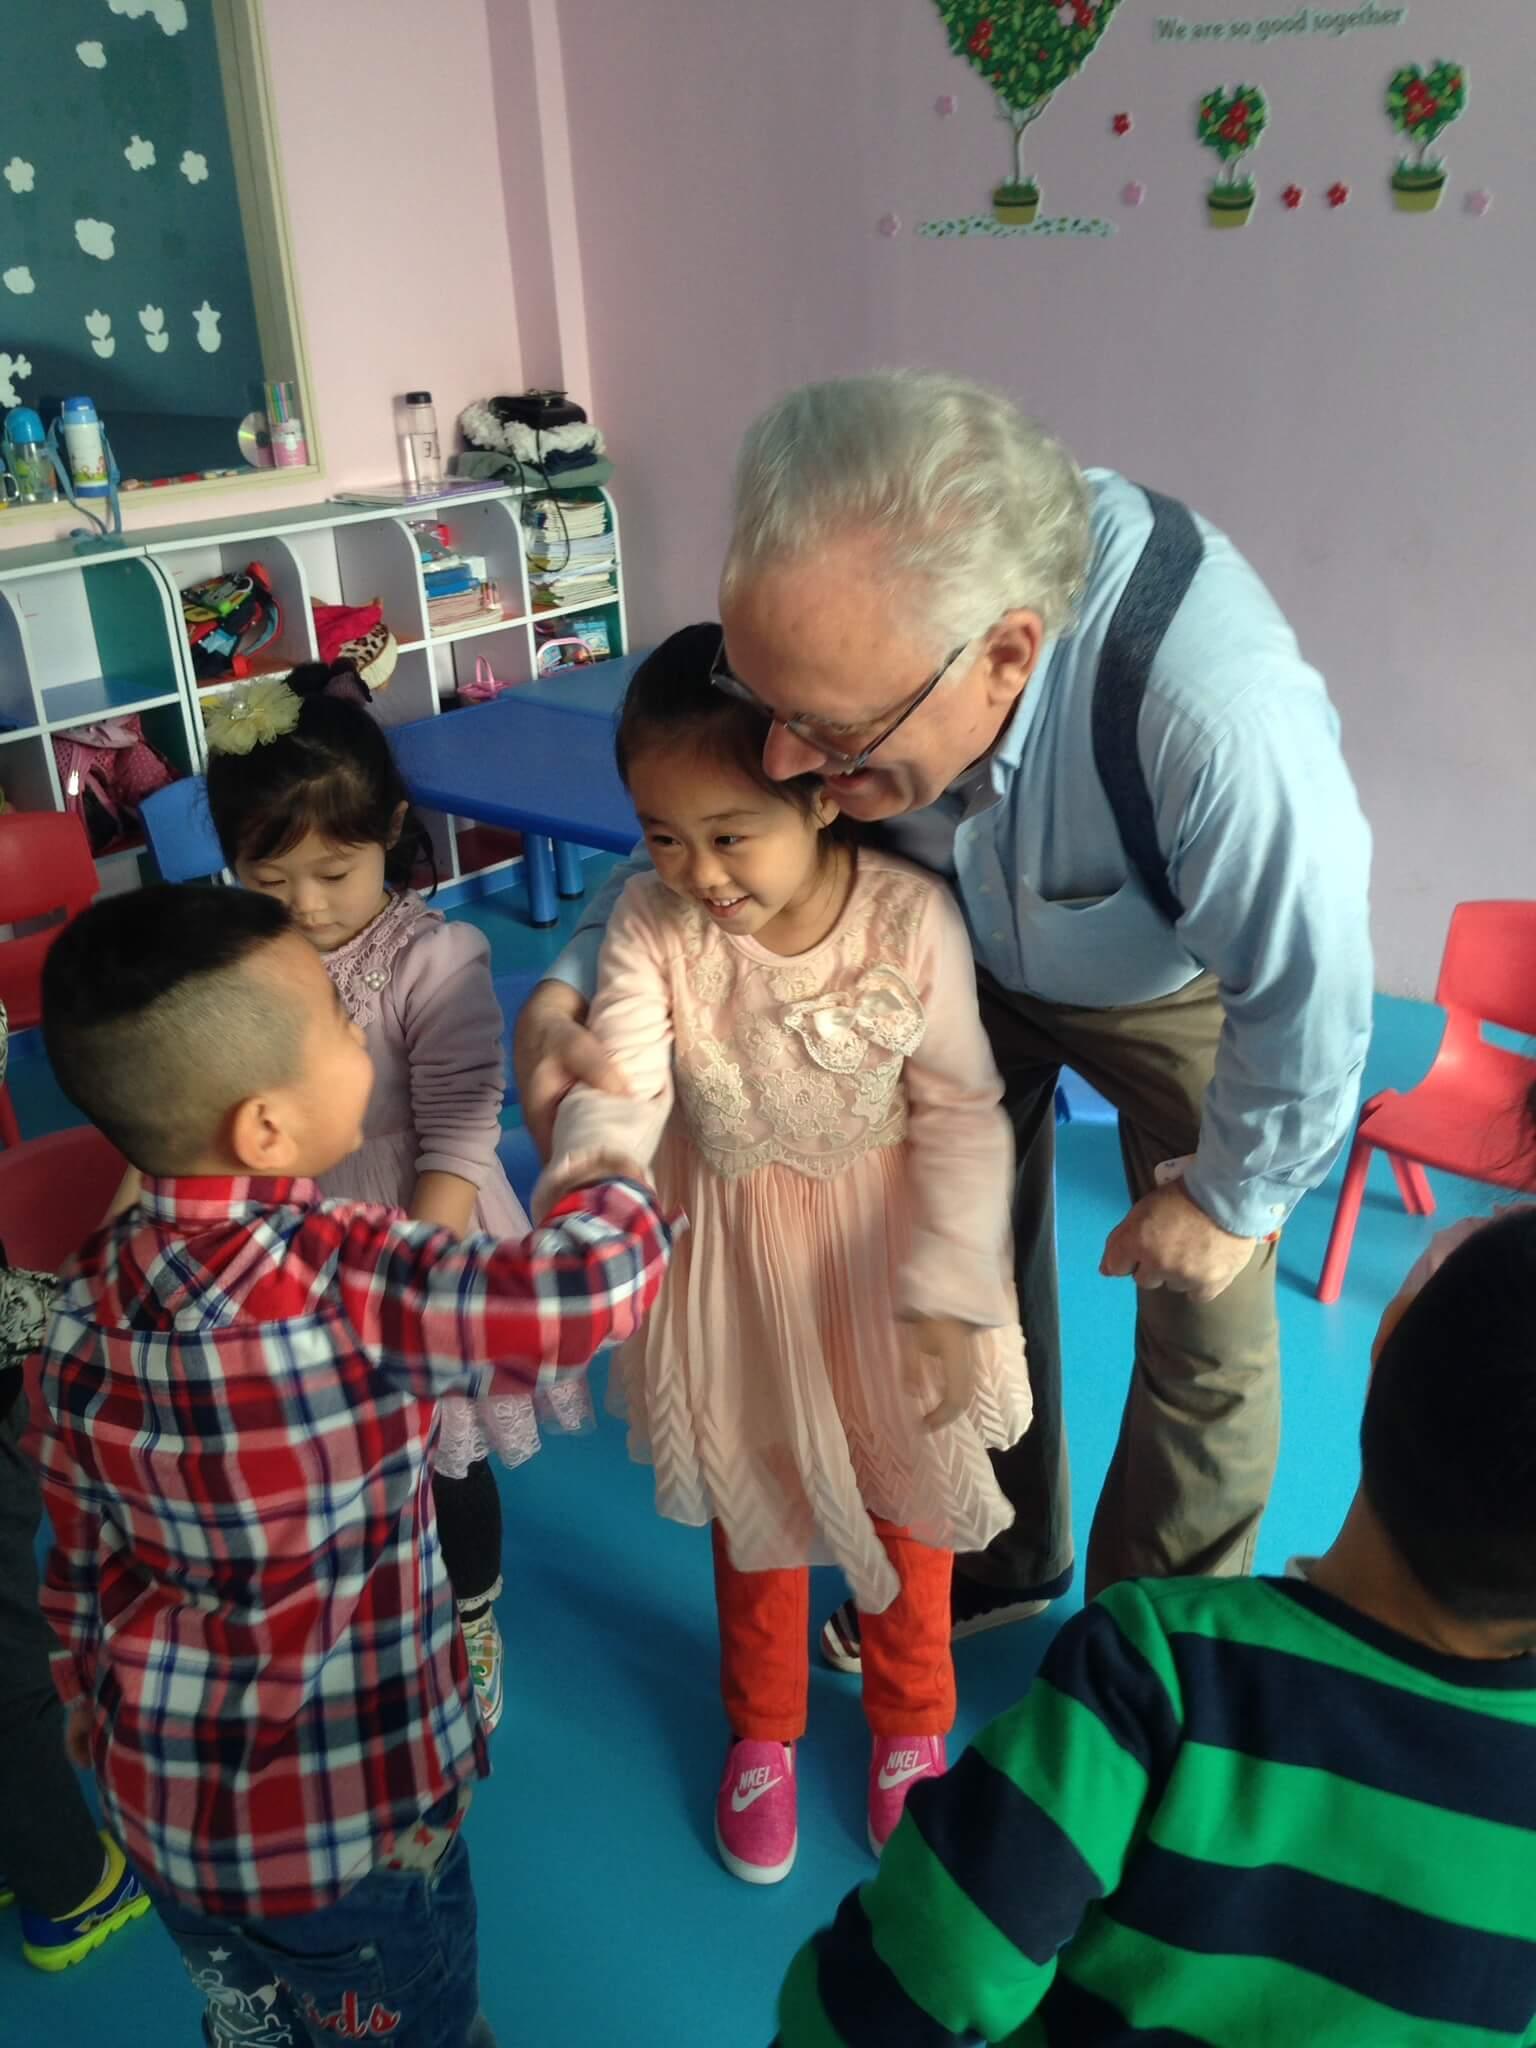 Alan Tomko EFL teacher in China